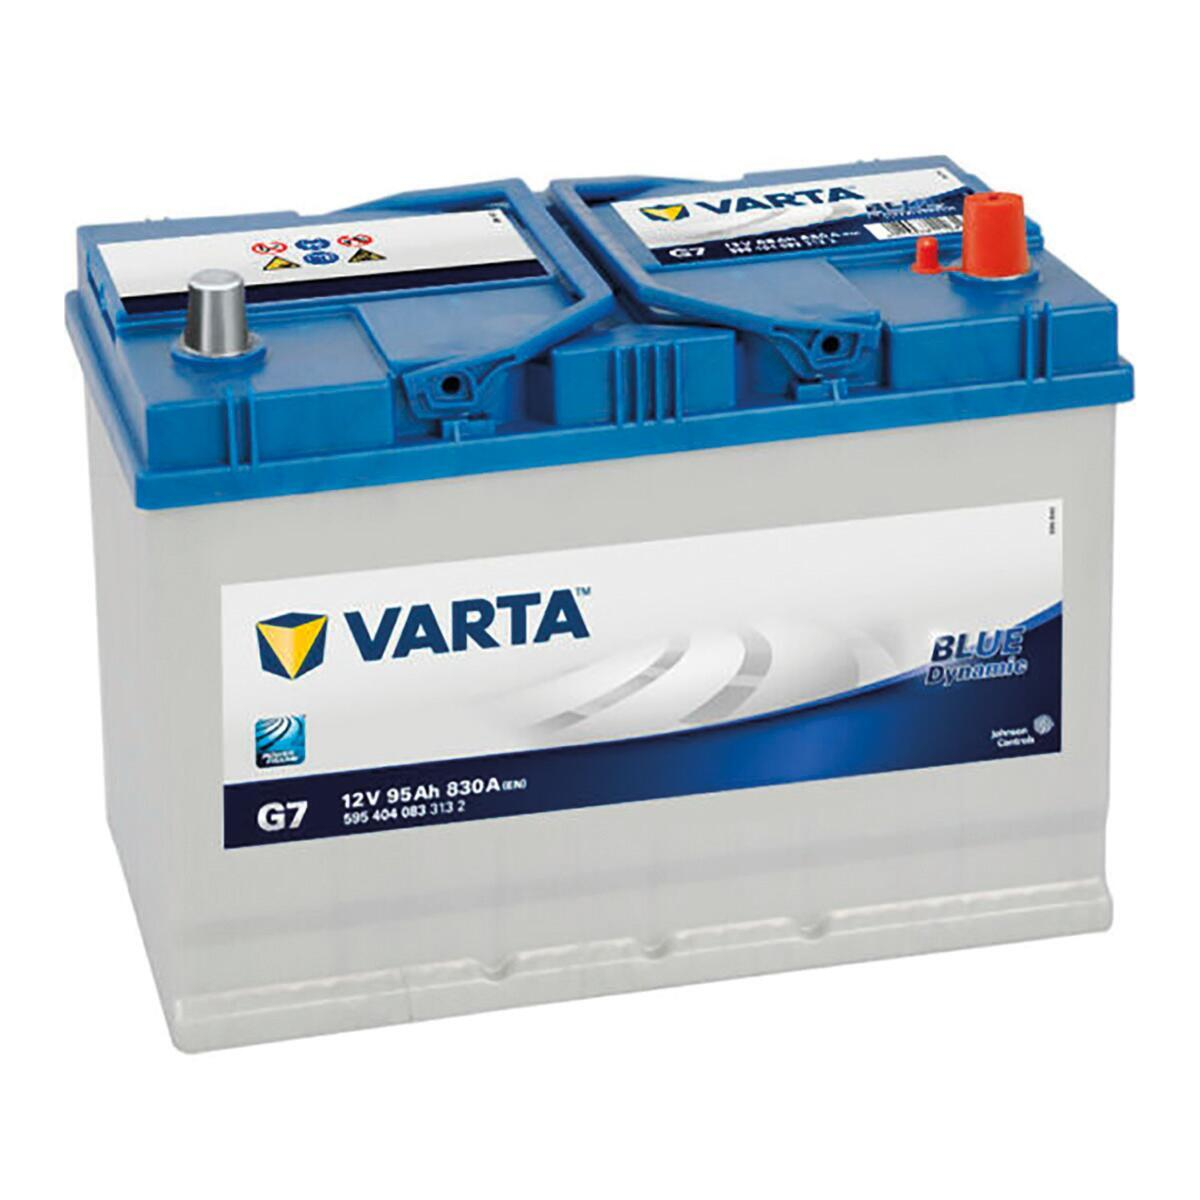 Batteria VARTA Blue Dynamic G7 polo destro in piombo 12 V 95 Ah